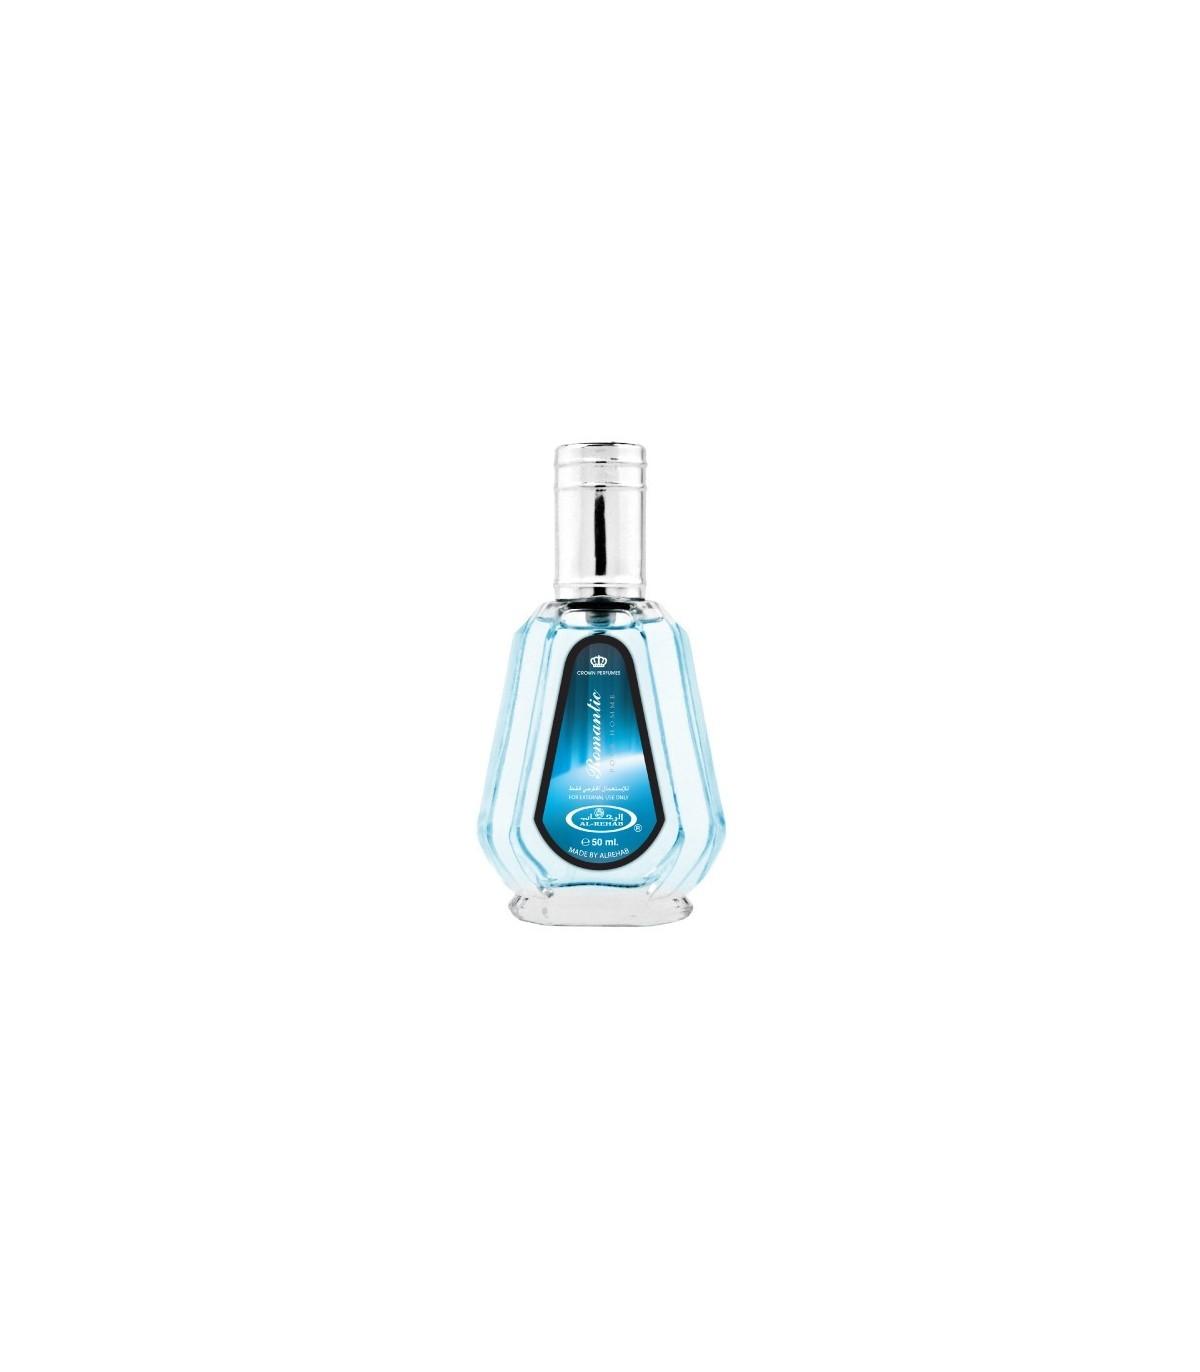 type romantique spray 50 ml de parfum. Black Bedroom Furniture Sets. Home Design Ideas